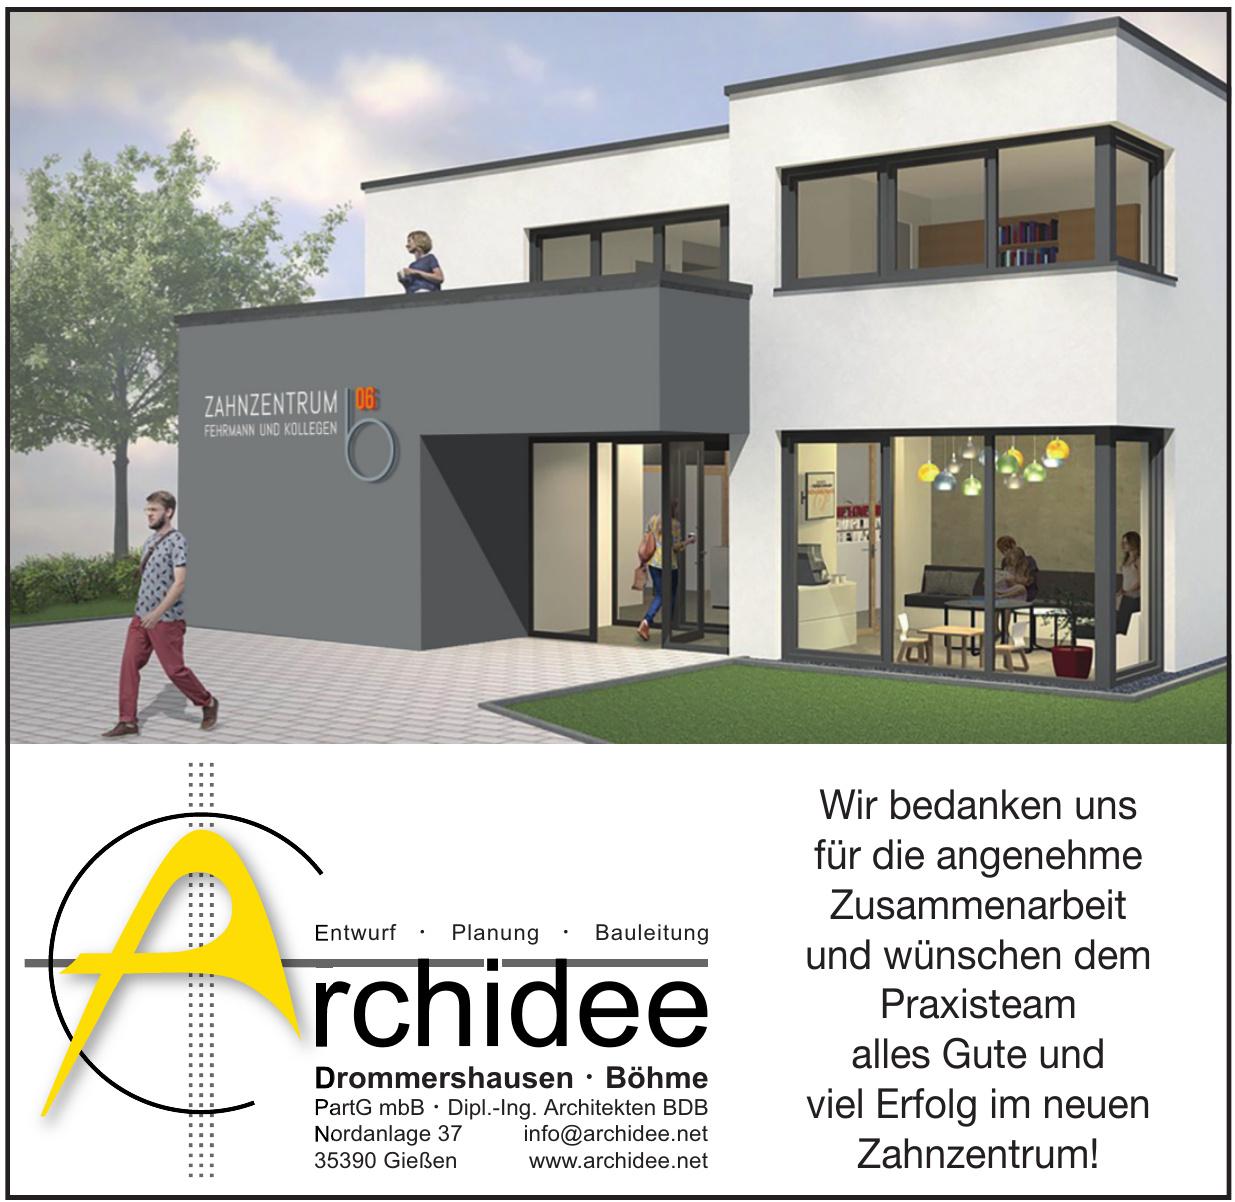 Archidee Drommershausen, Böhme PartG mbB